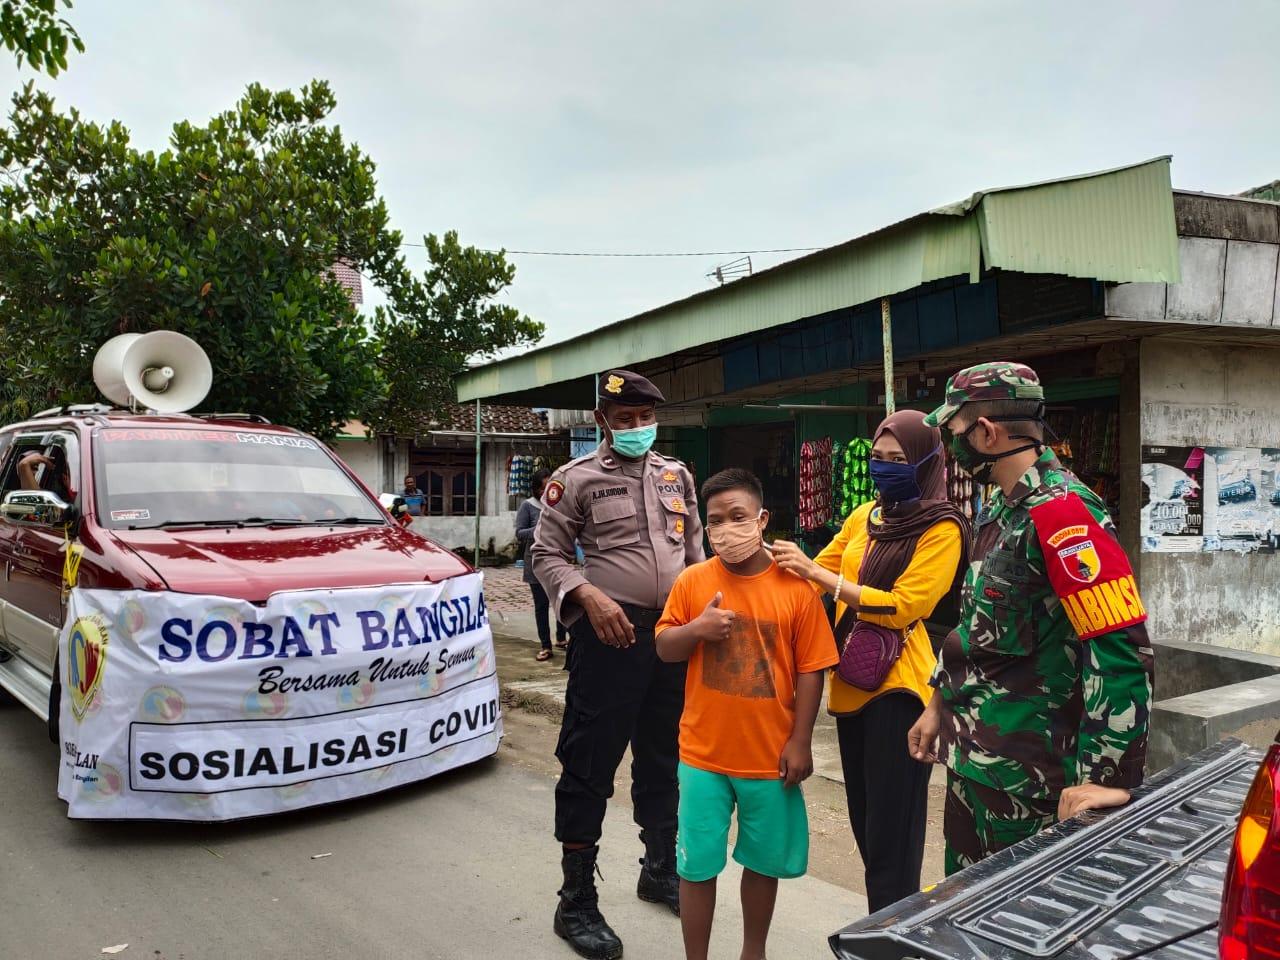 Sosialisasi dan Bagi Masker Aksi Cepat Hadapi Pandemi Virus Corona di Kecamatan Bangilan